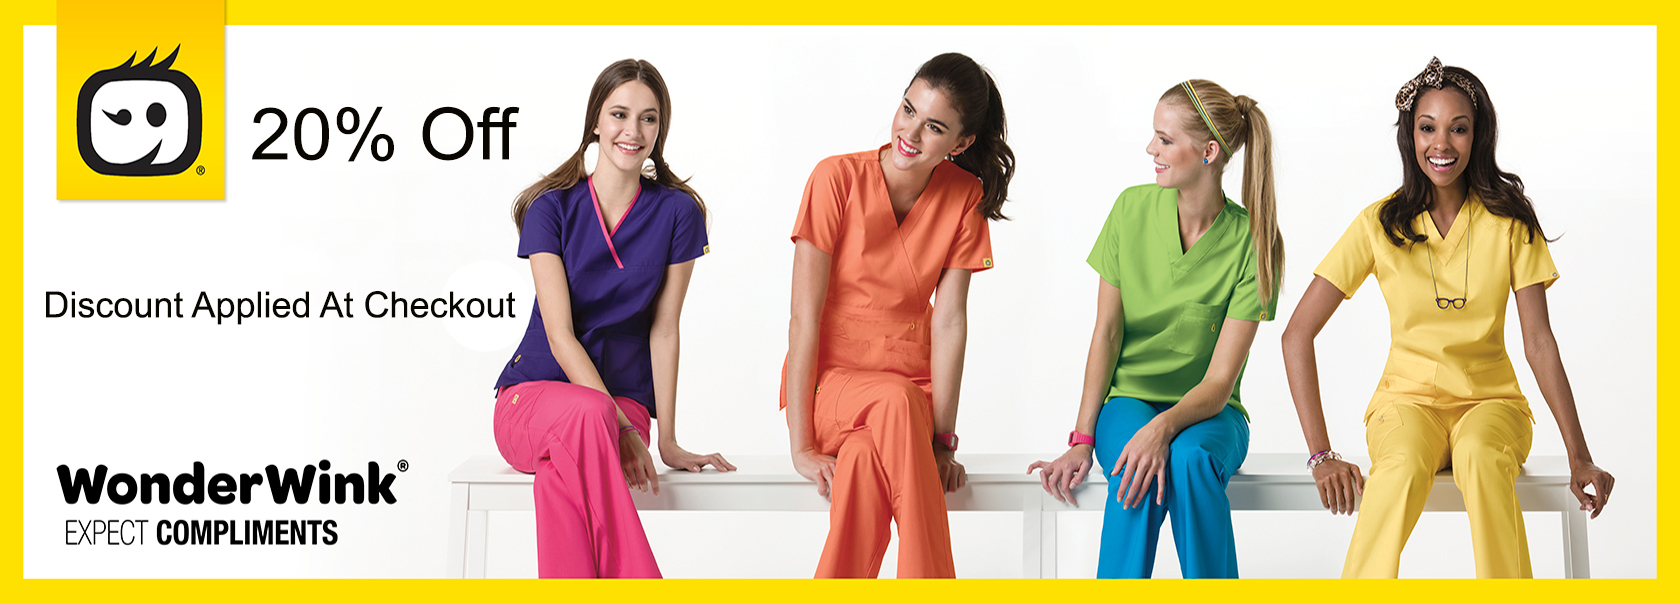 20% Off WonderWink Scrubs & Medical Uniforms